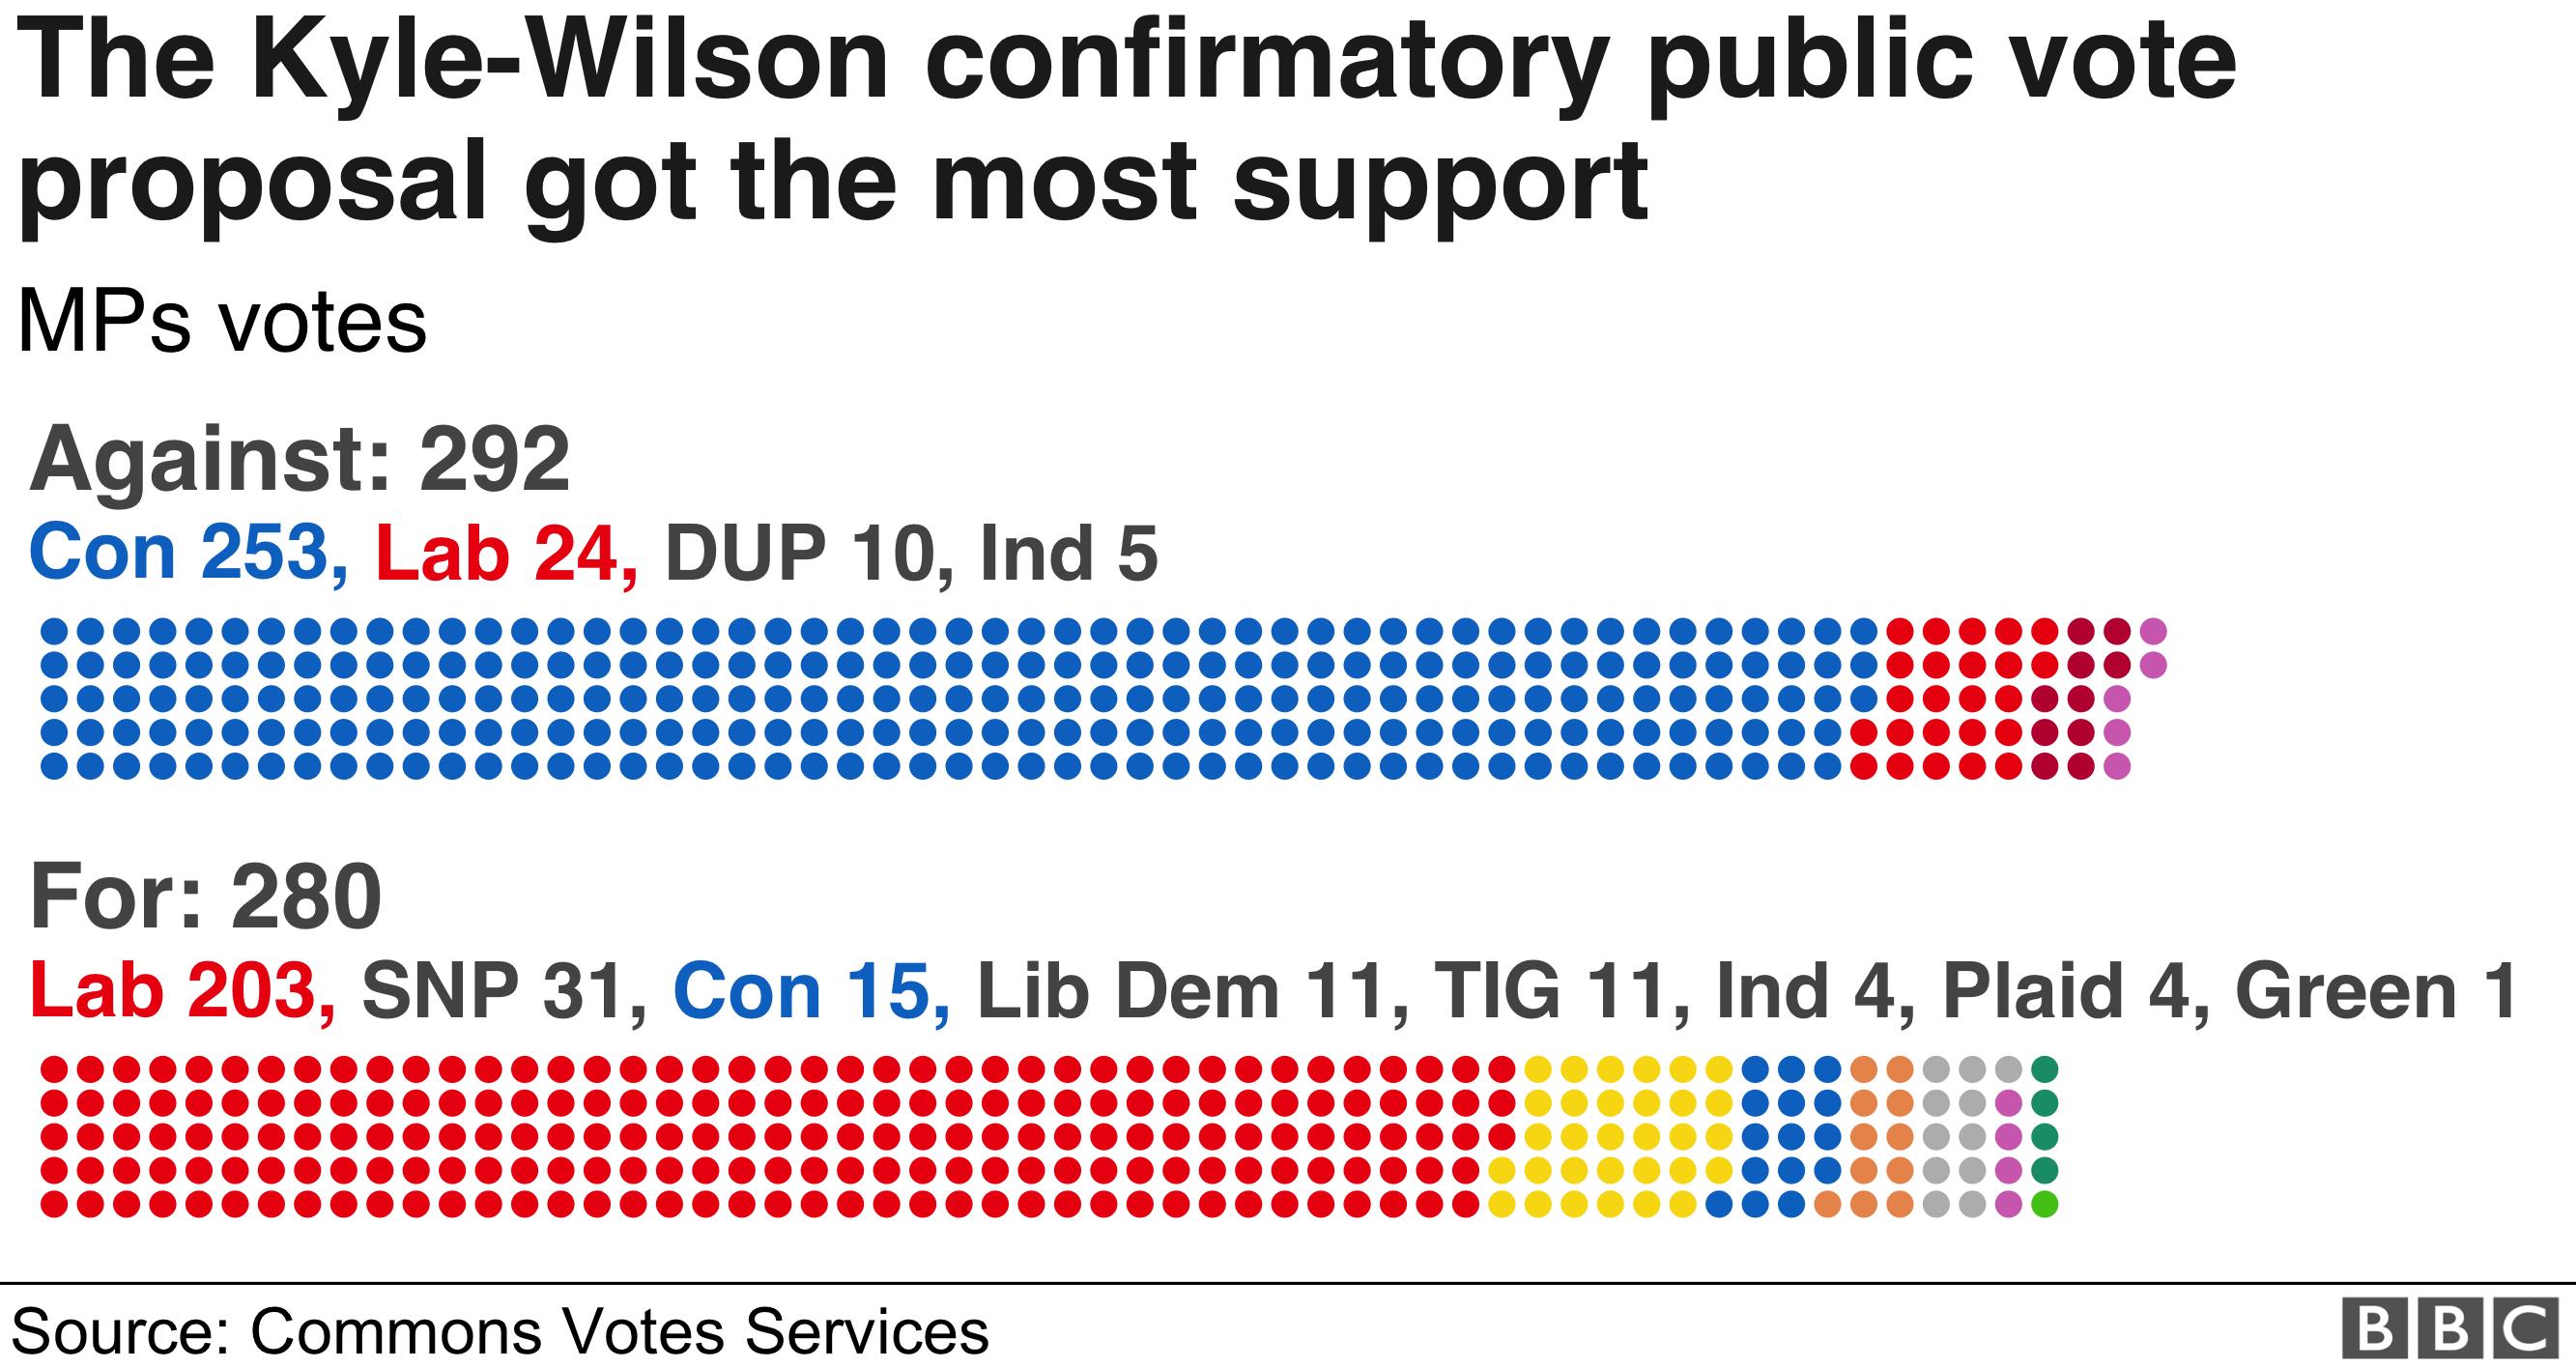 Graphic of confirmatory public vote